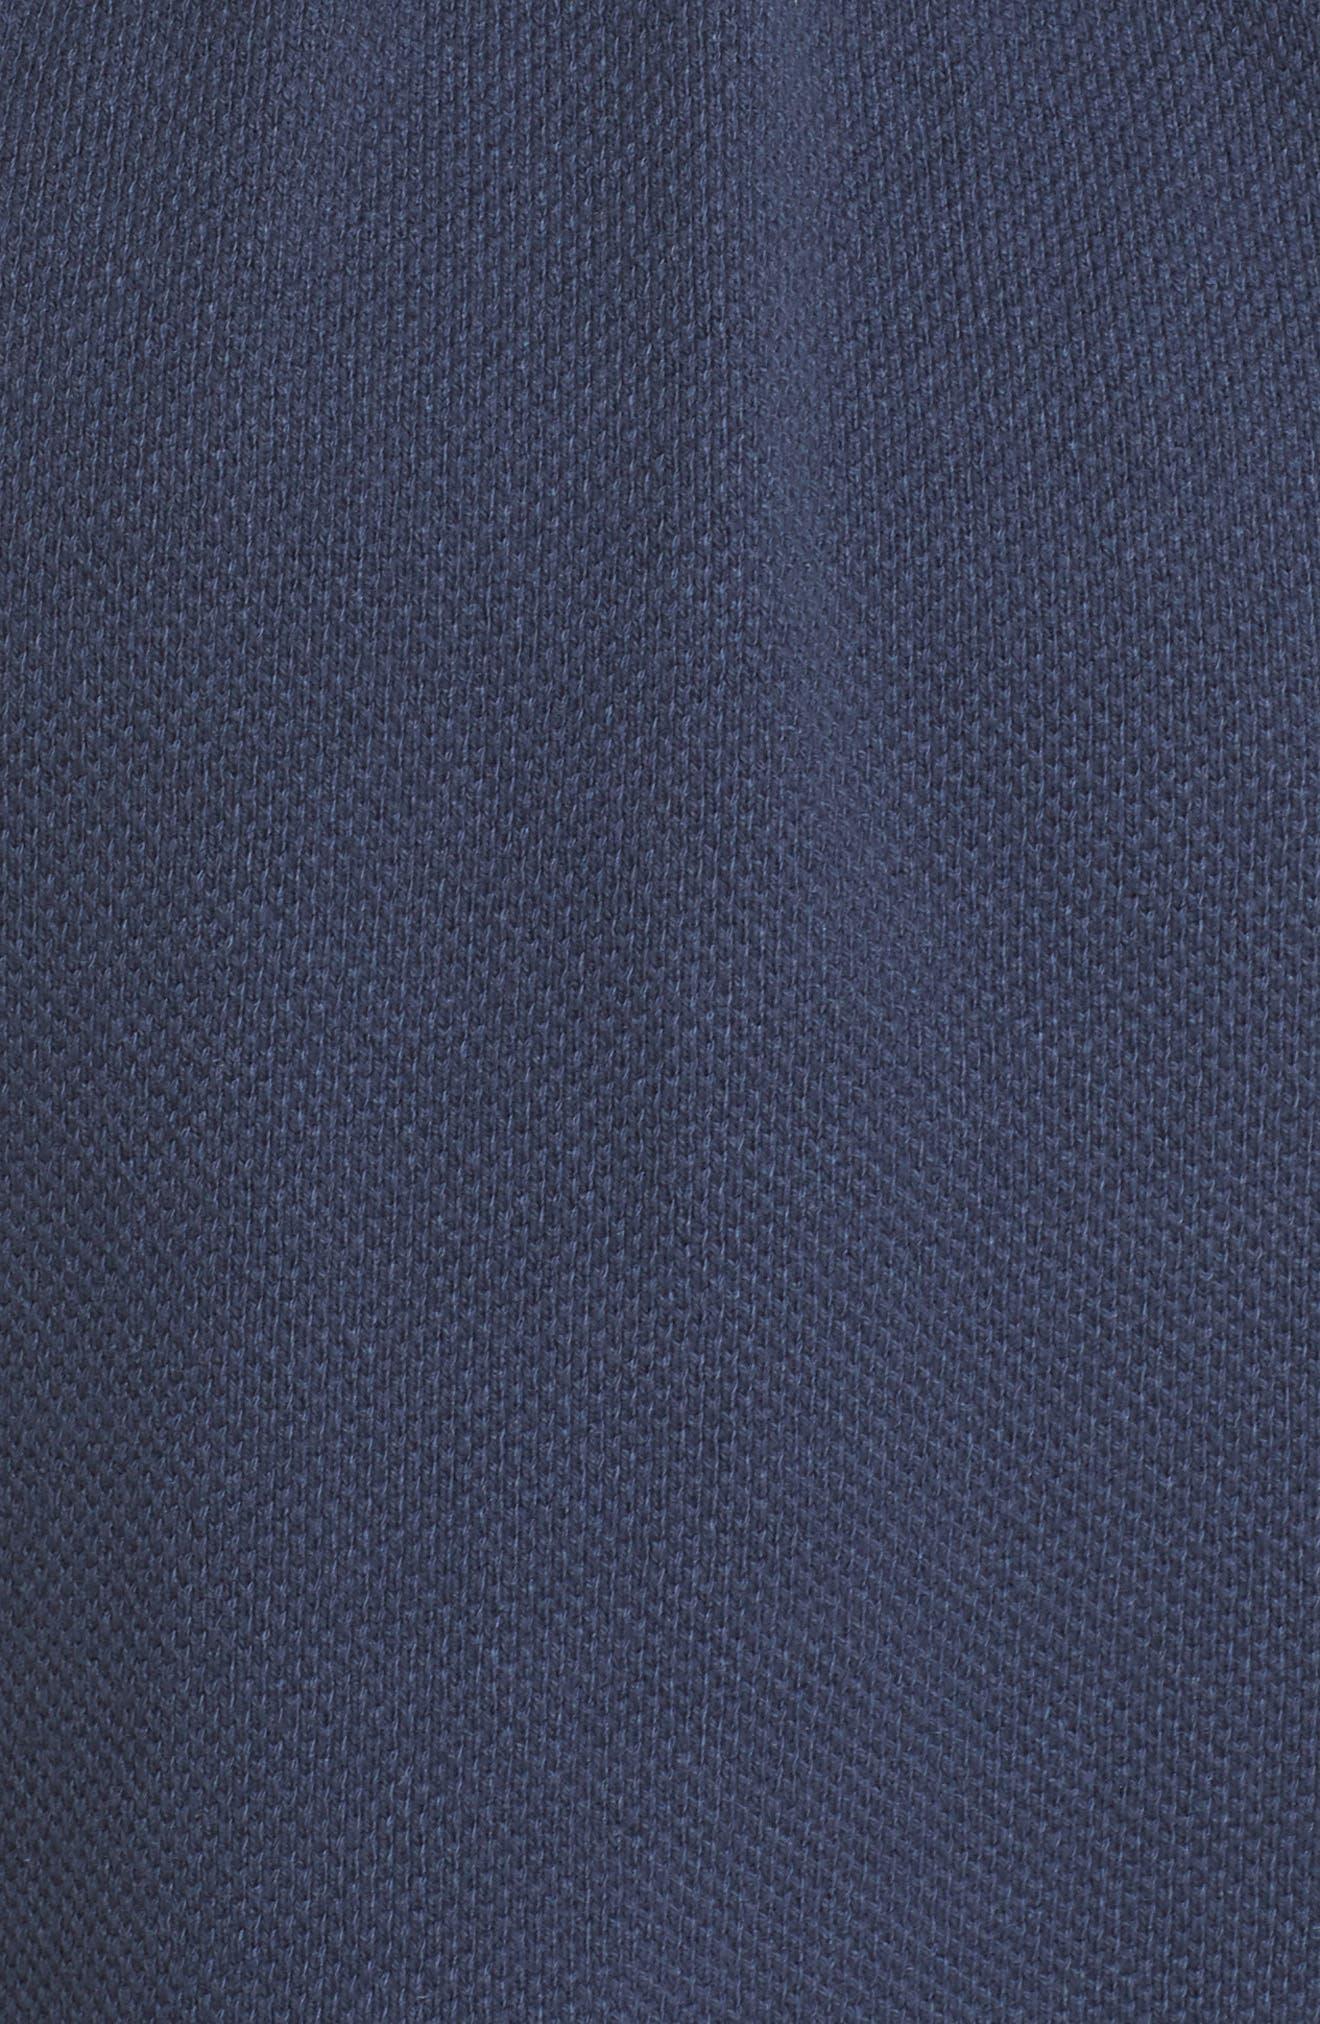 Tie Waist Knit Hooded Jacket,                             Alternate thumbnail 6, color,                             Navy Indigo